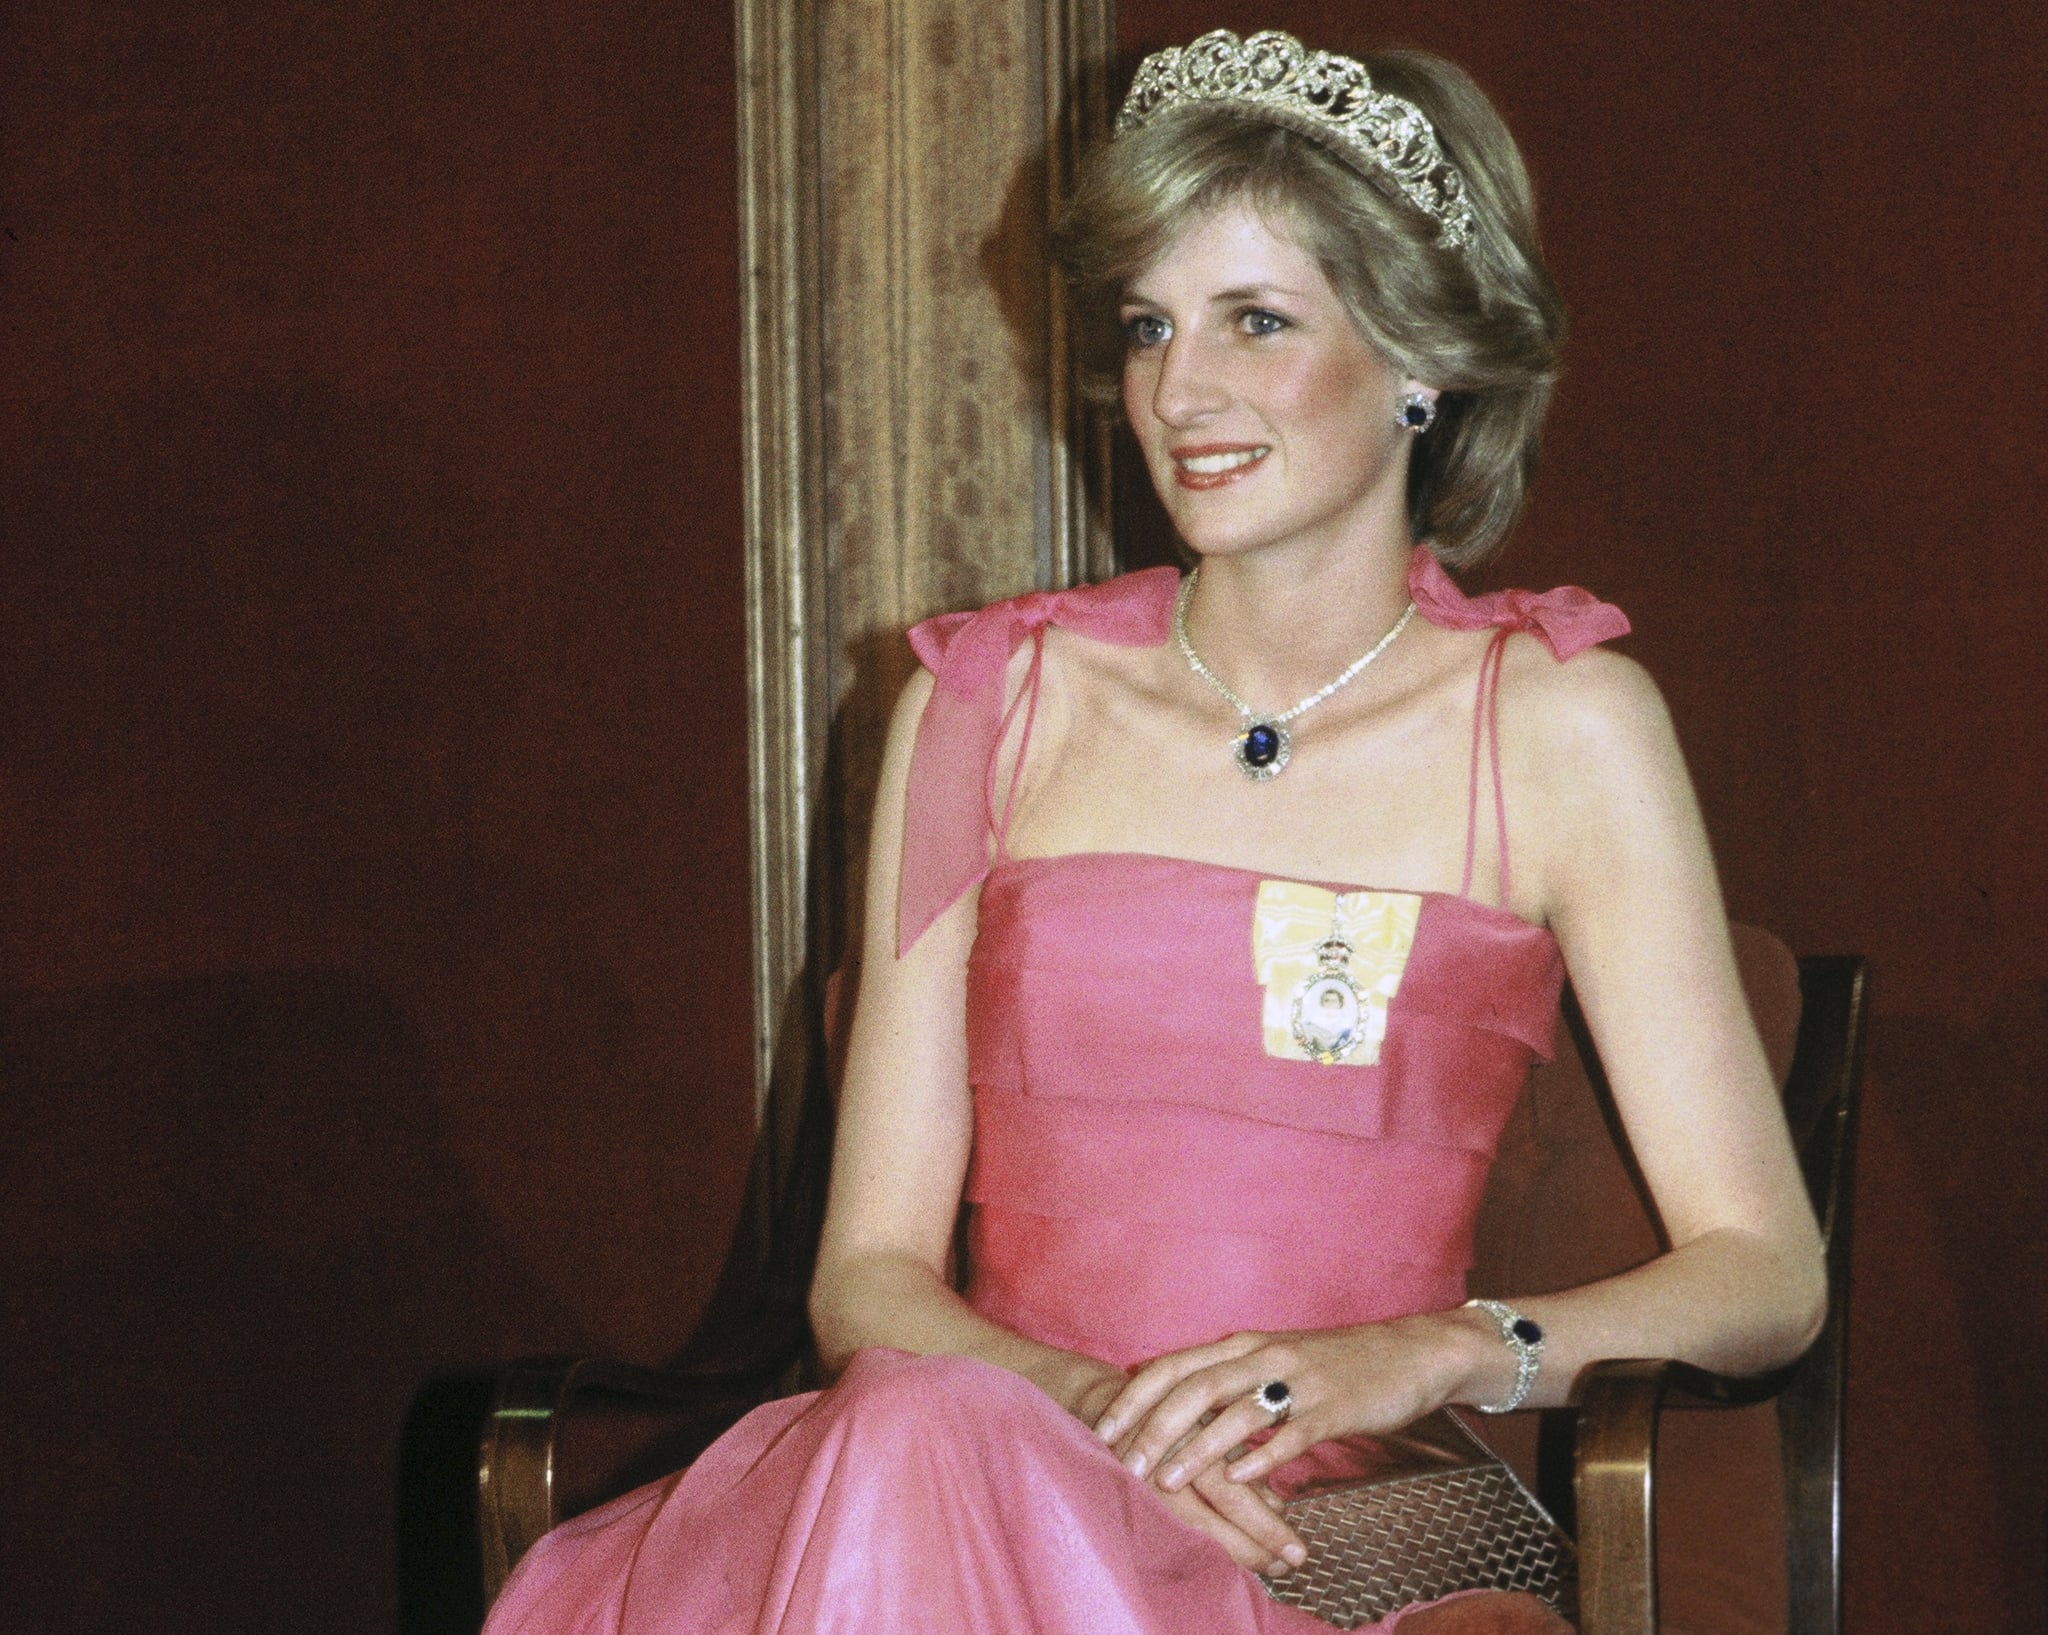 How Old Was Princess Diana When She Died? | POPSUGAR Celebrity Australia